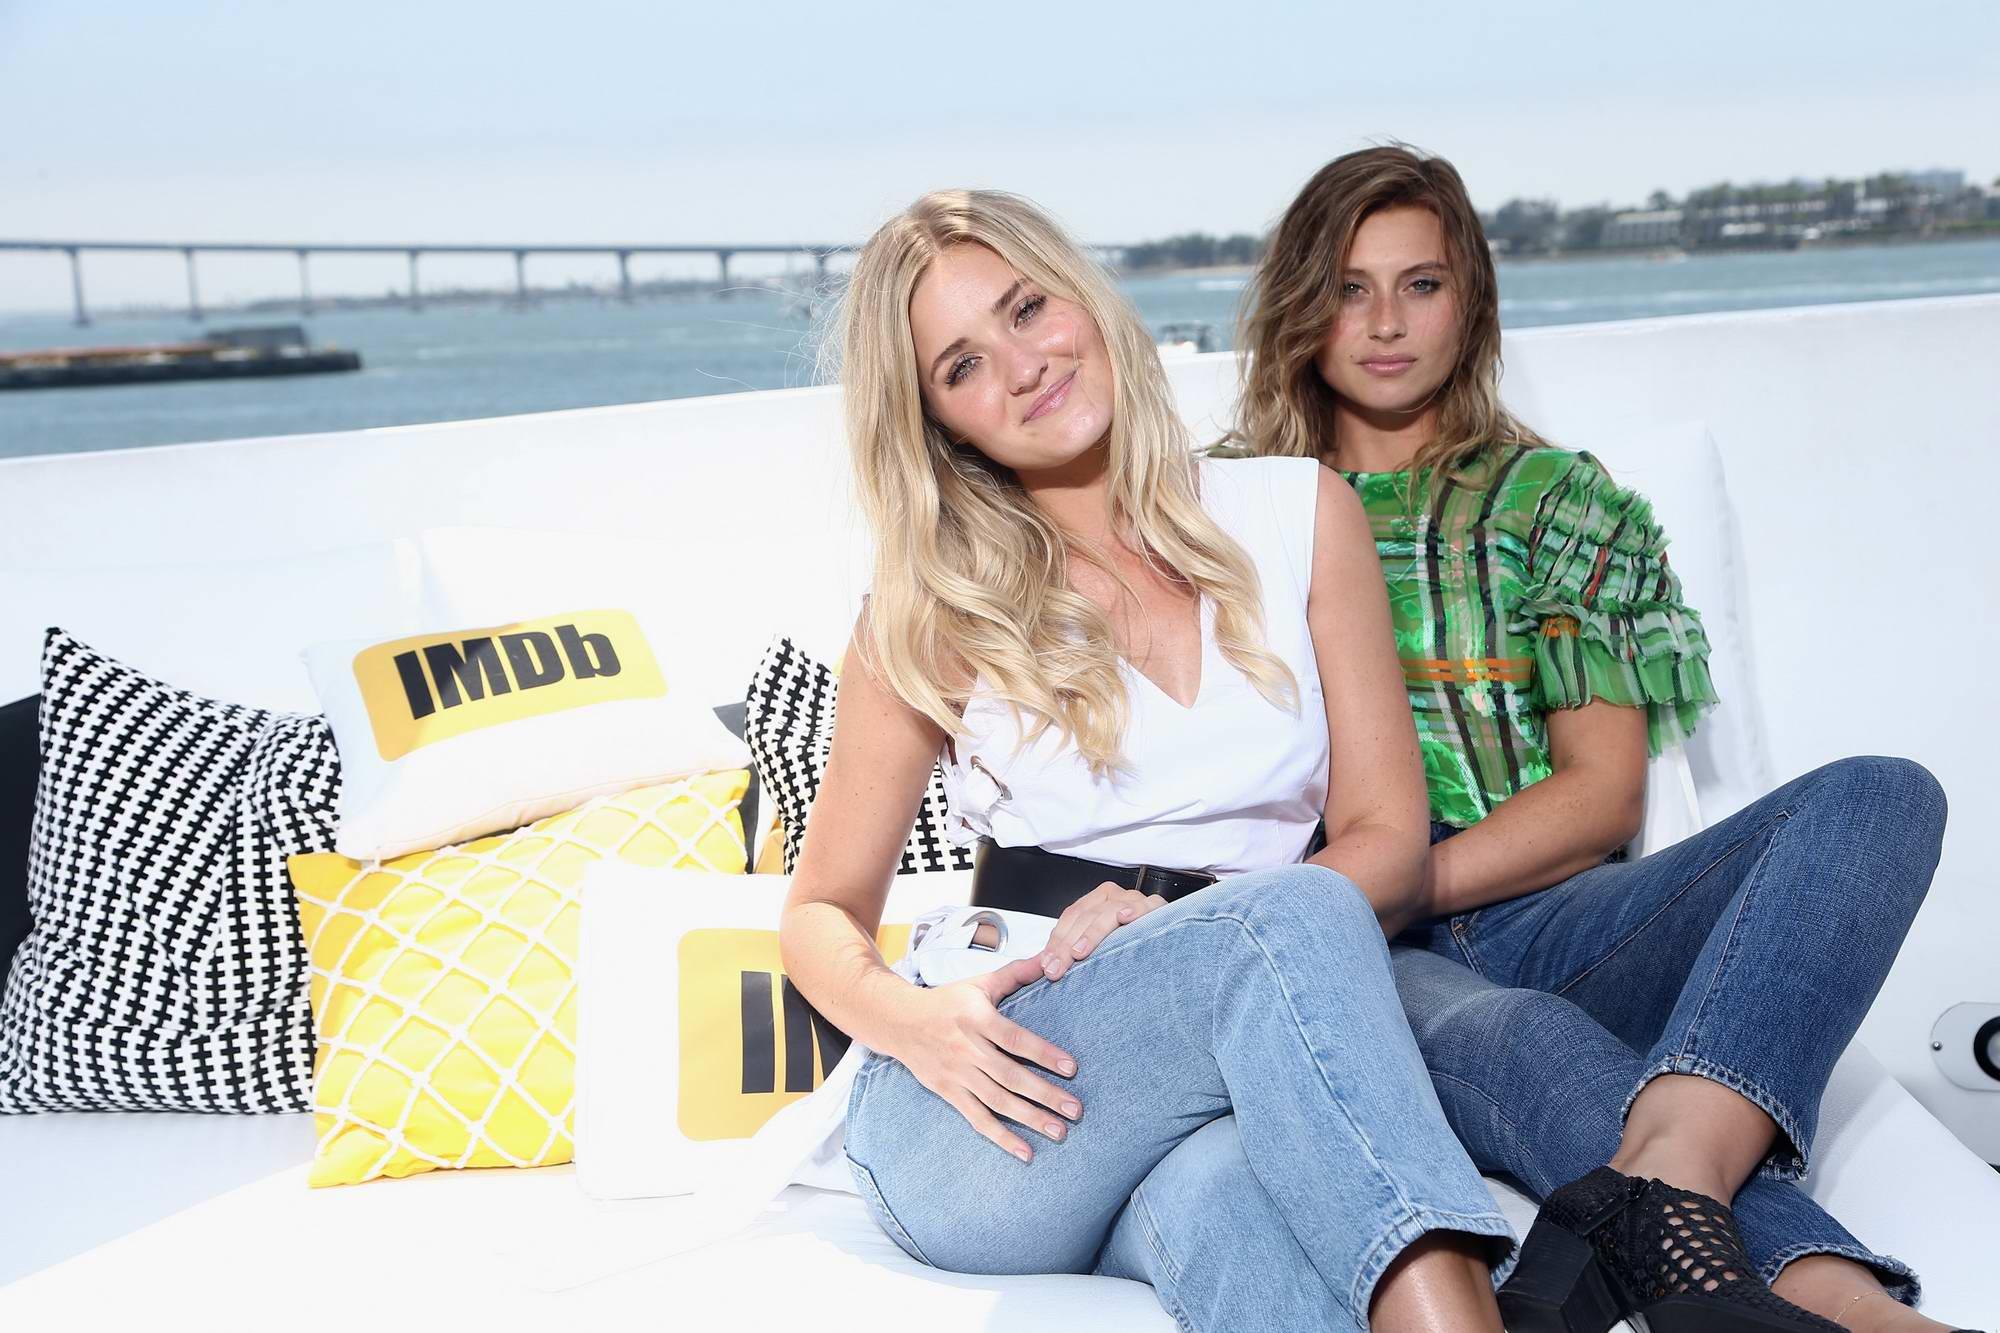 Aly and Amanda Michalka visits IMDBoat at Comic Con International 2017 in San Diego